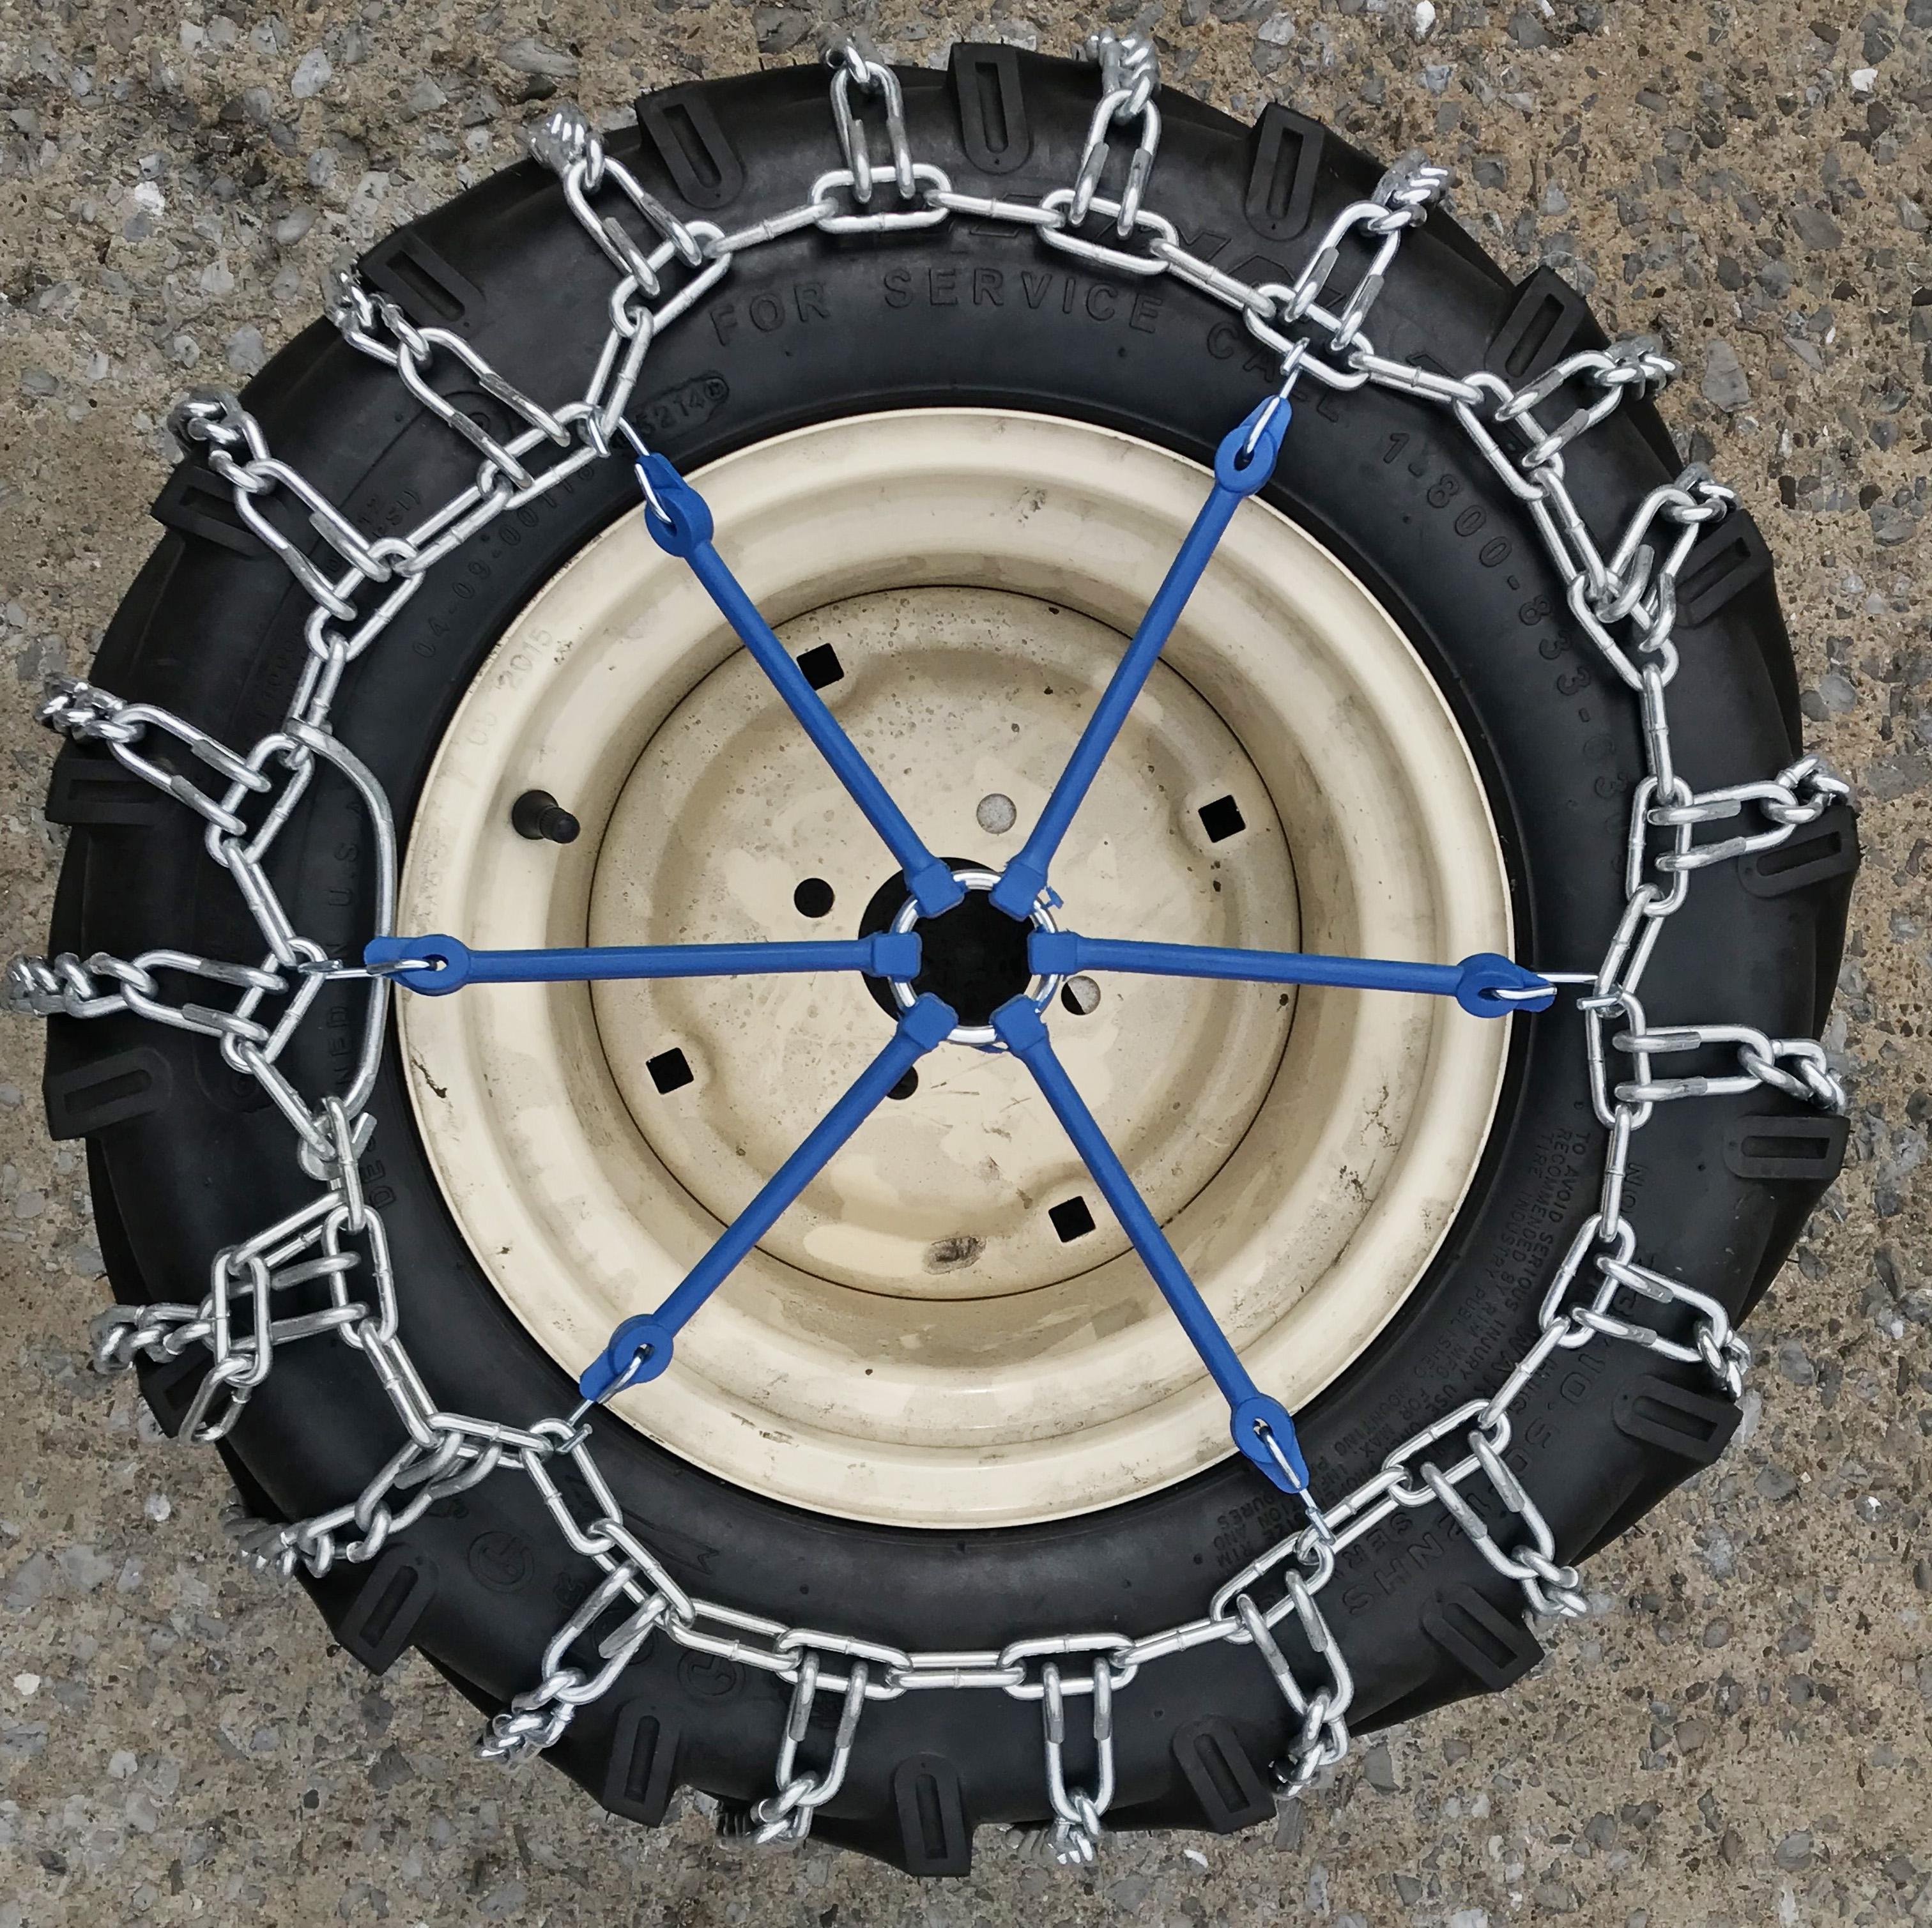 NOT V-BAR Tire Chains TireChain.com Polaris RZR 900 XC//900 S 2015 F 27x9-12 ATV UTV NOT Studded